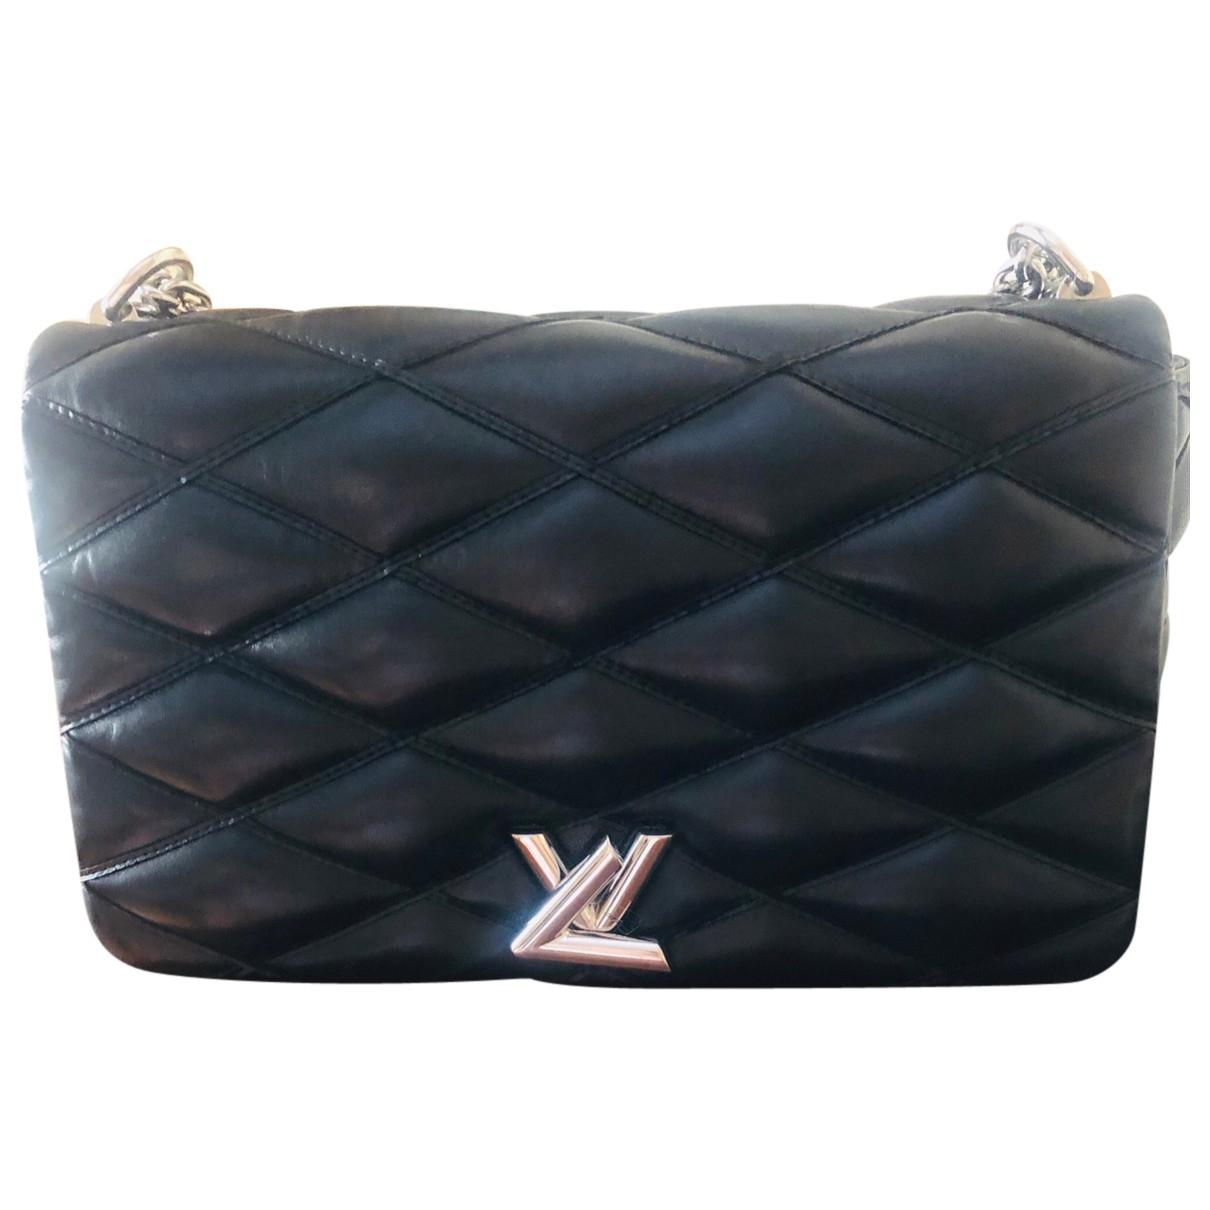 Louis Vuitton GO 14 Black Leather handbag for Women \N